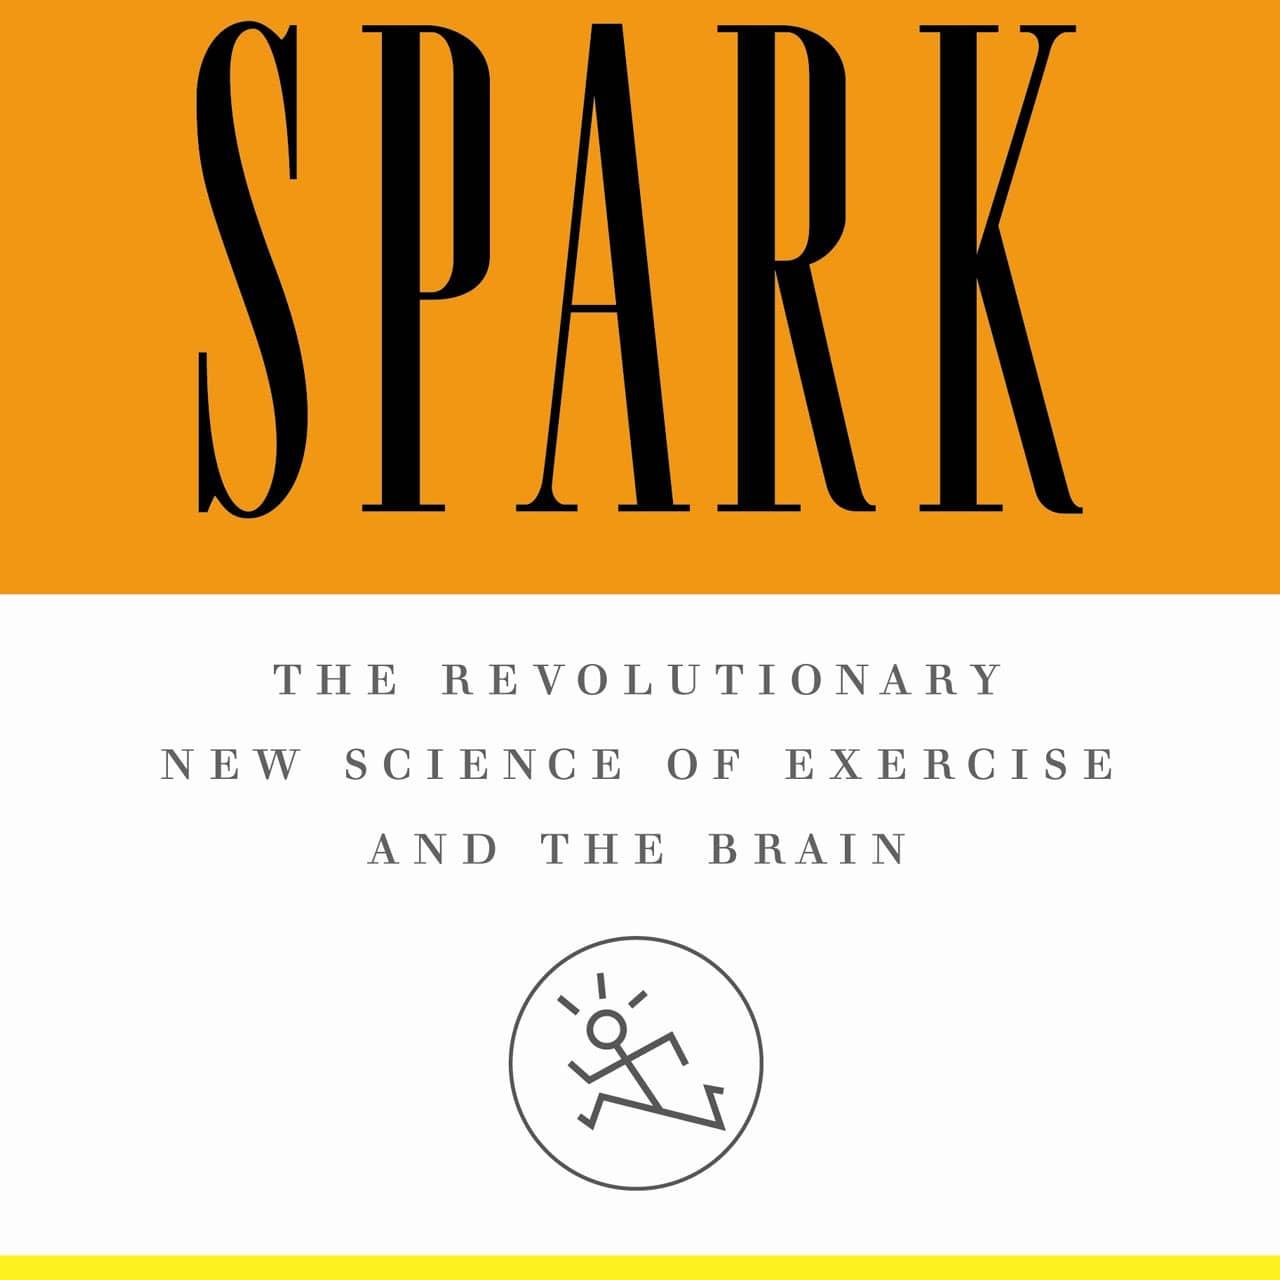 Bokomslag för boken Spark – The Revolutionary New Science of Exercise and the Brain